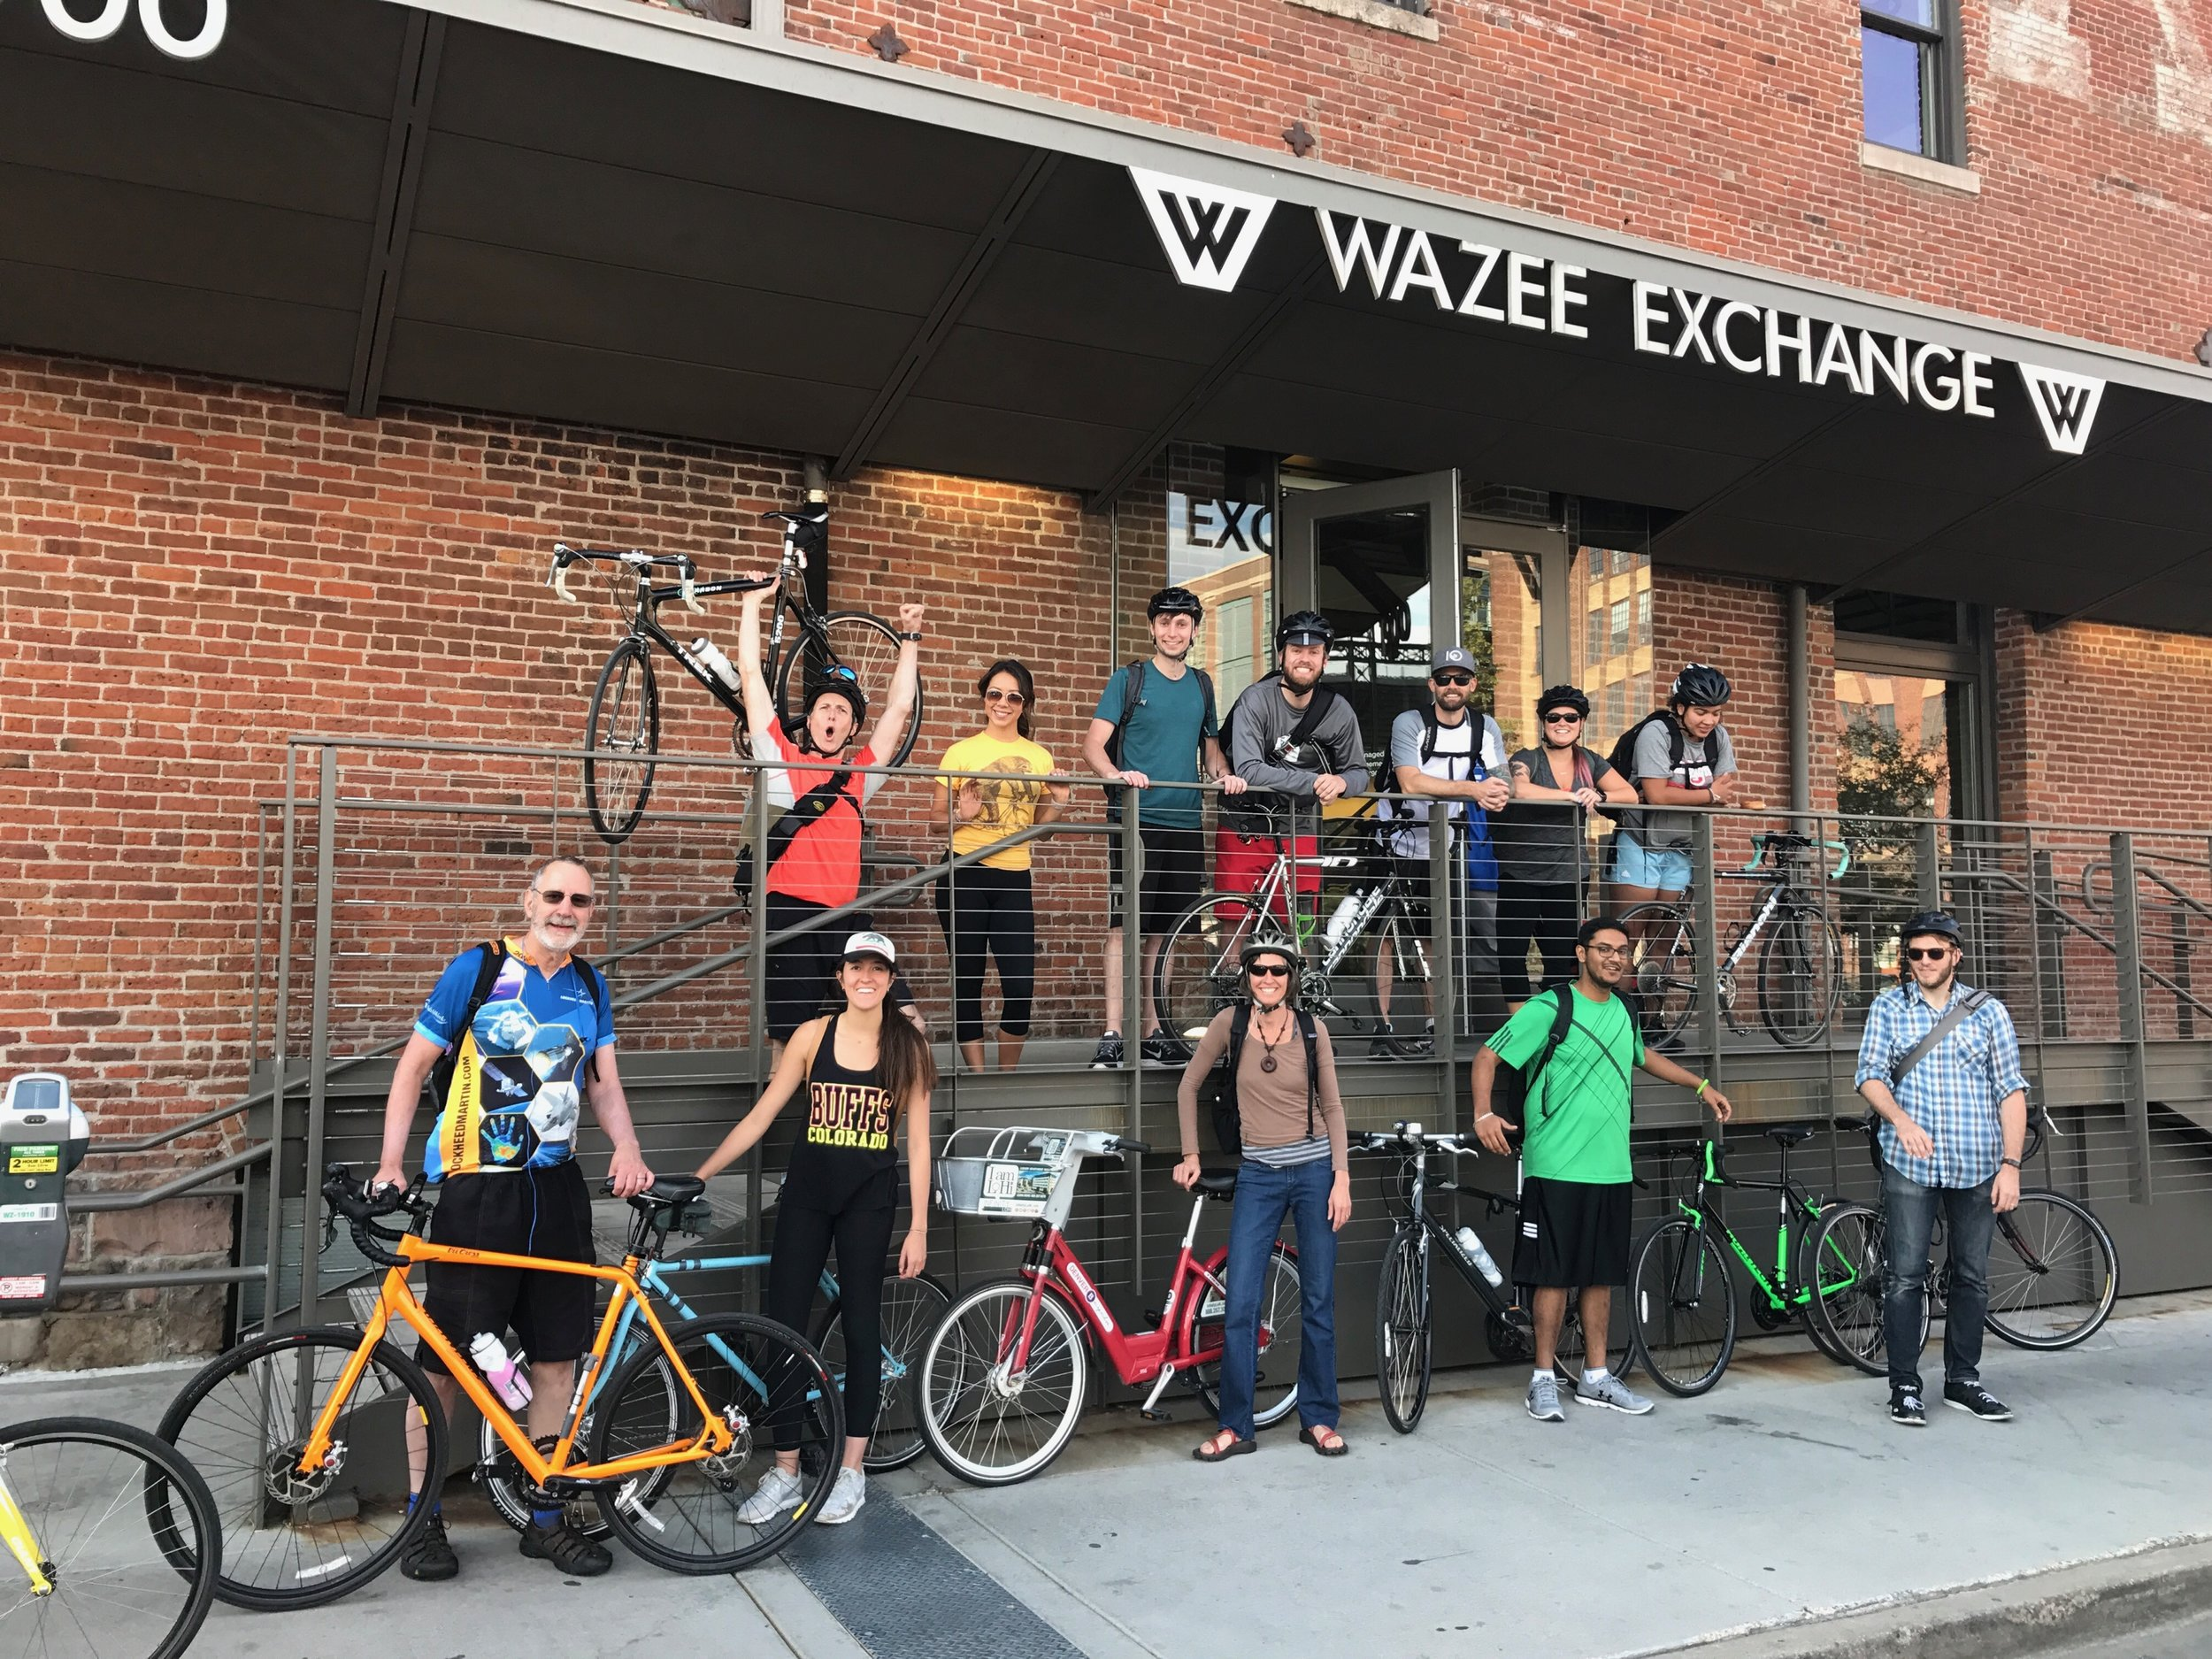 2017 06 28 - Bike to Work Day  (11).JPG